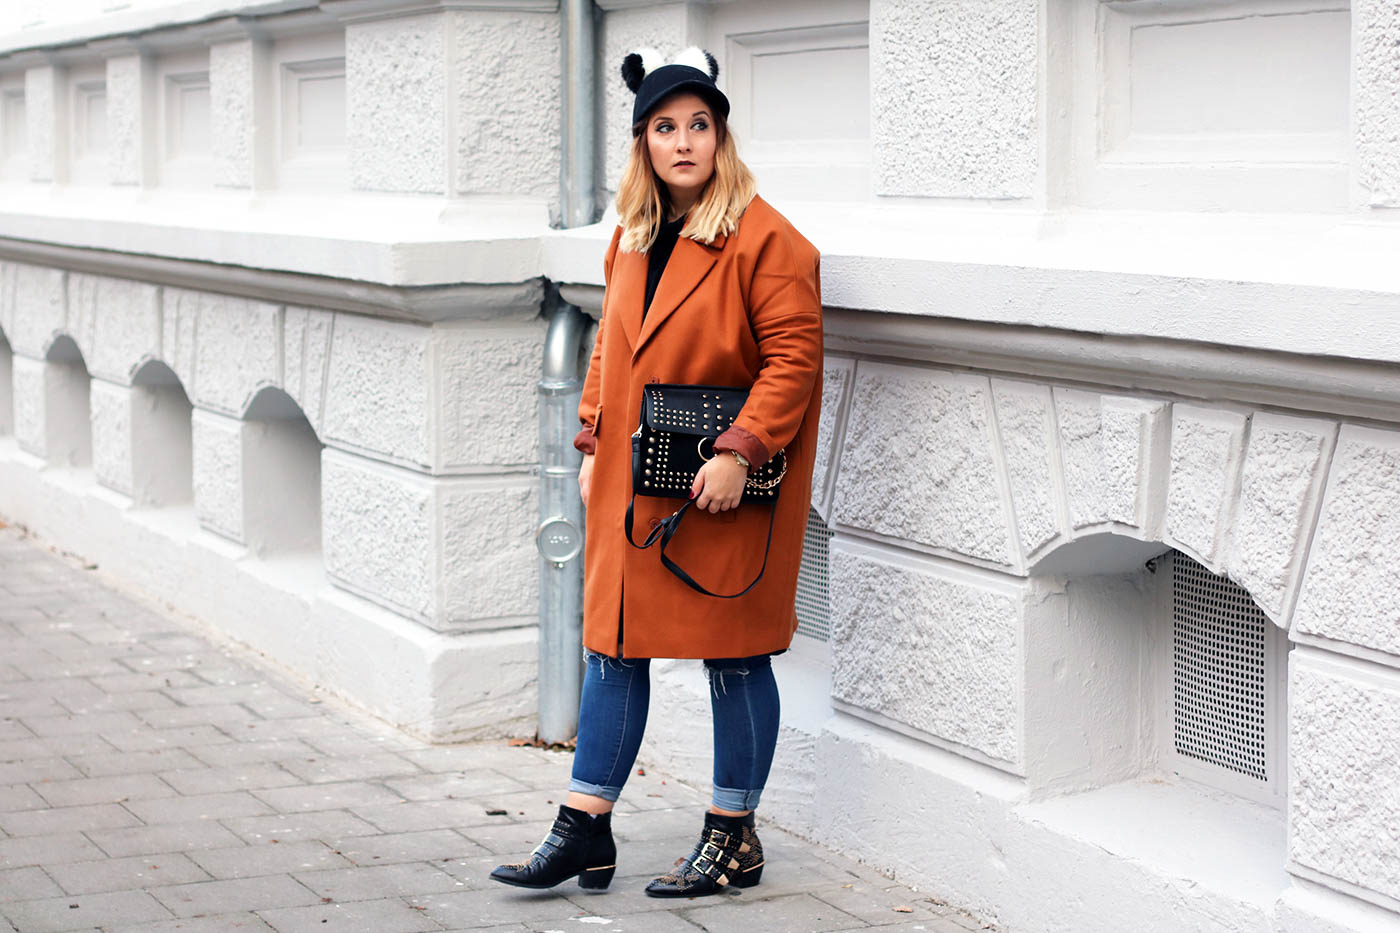 outfit-look-style-mantel-cappe-fashionblog-modeblog-gewinnspiel4